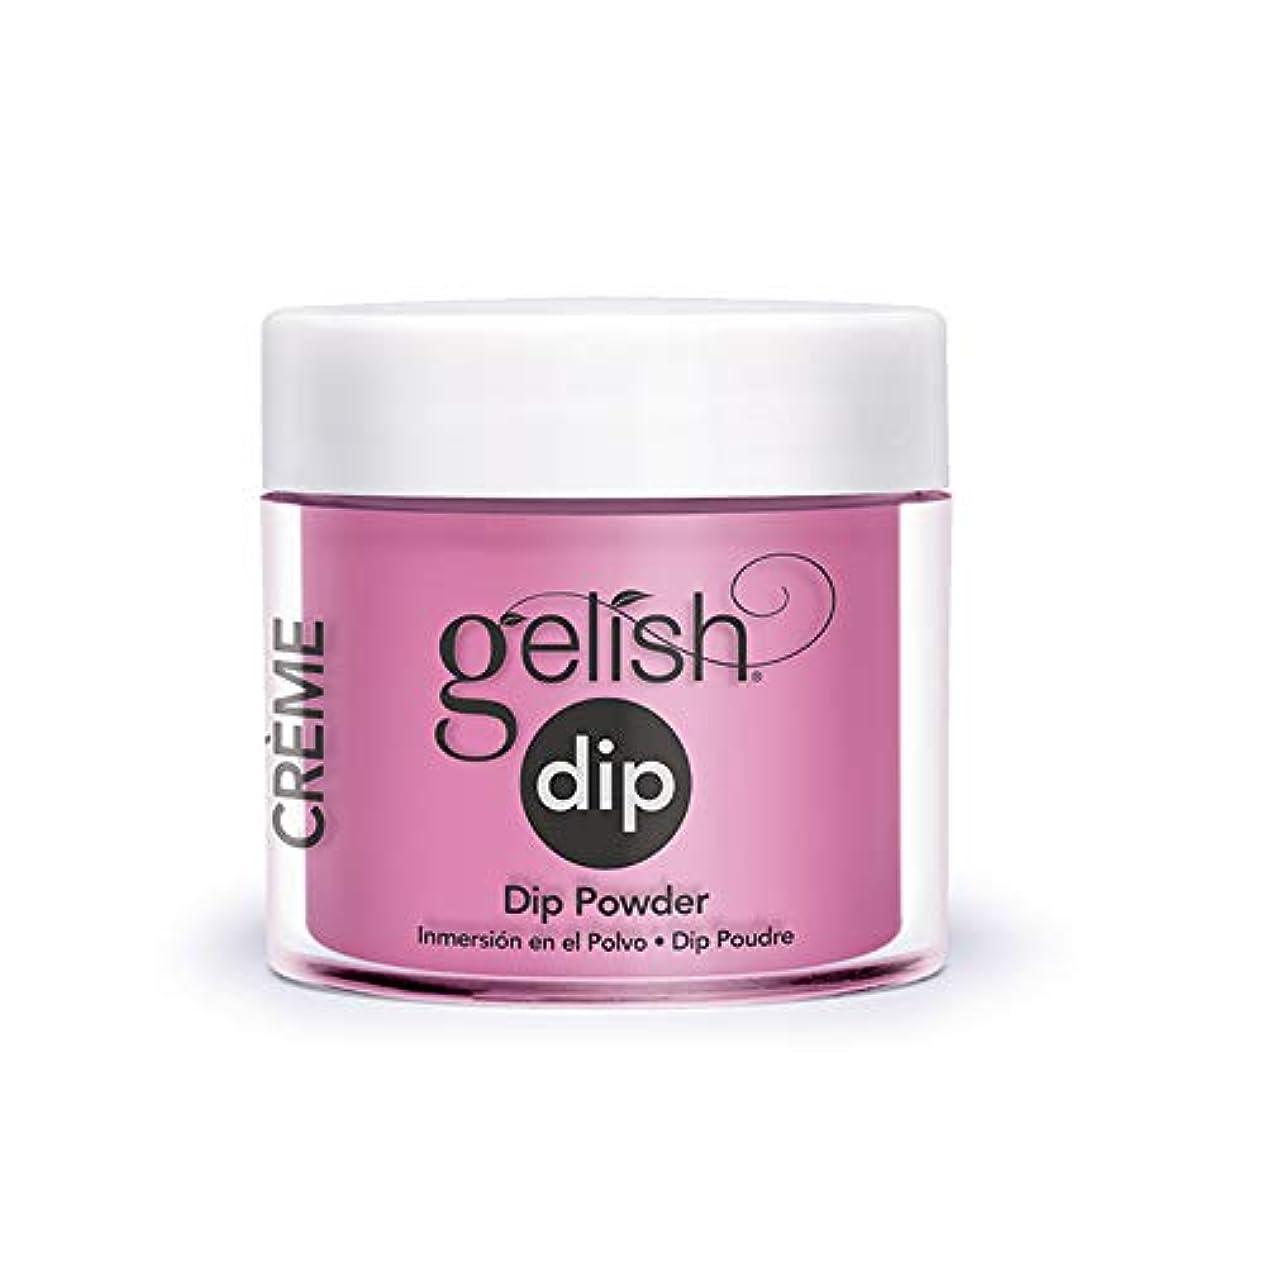 Harmony Gelish - Acrylic Dip Powder - New Kicks on the Block - 23g / 0.8oz